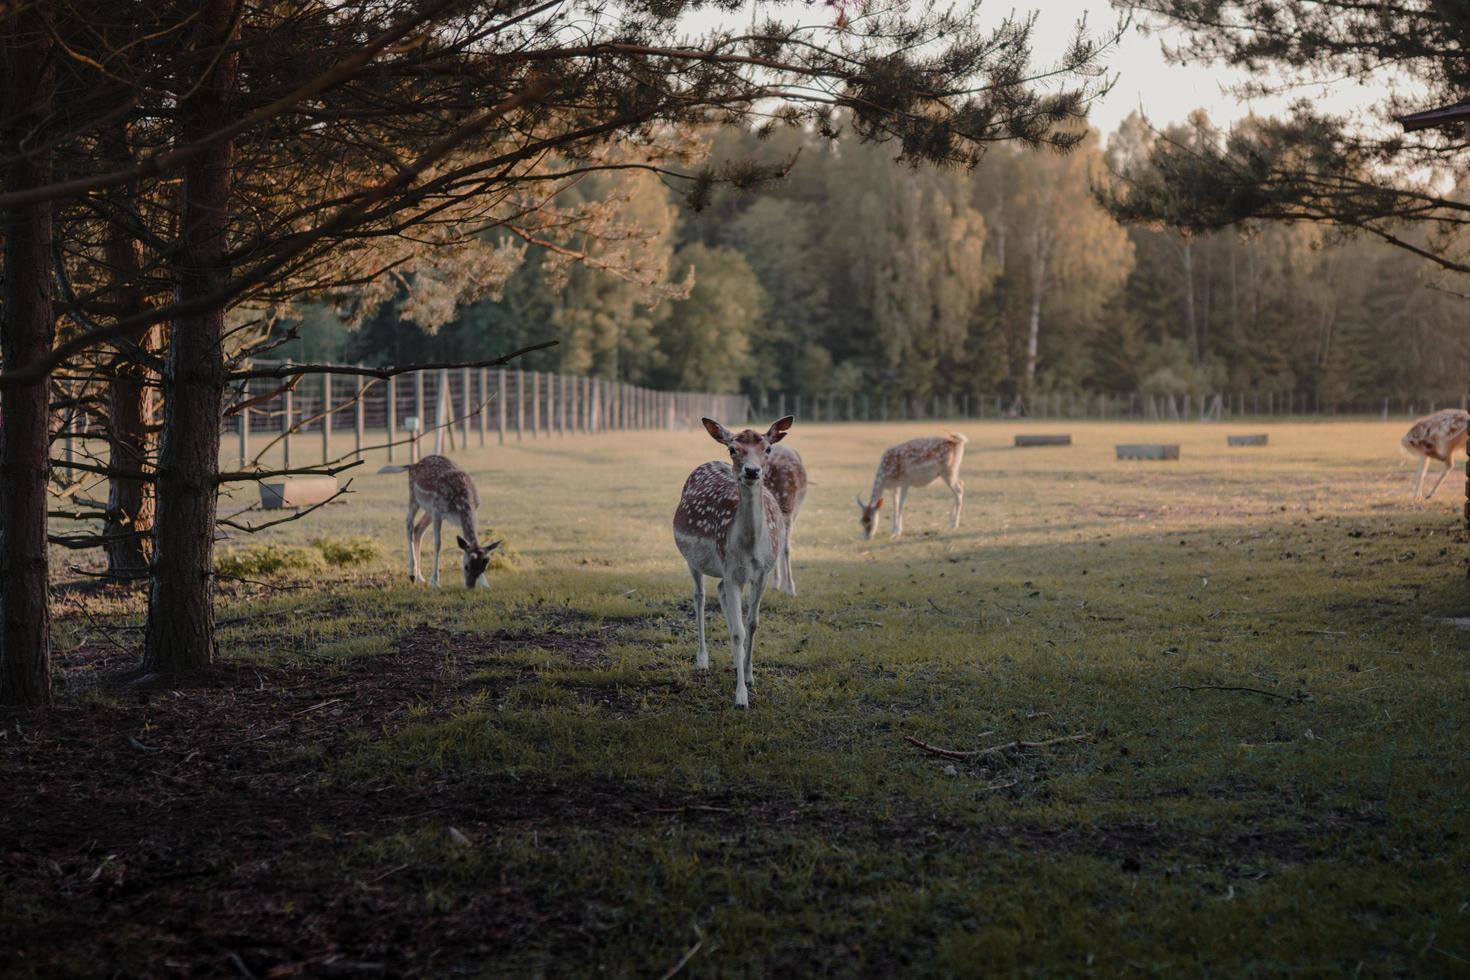 Brown deer approaches viewer photo